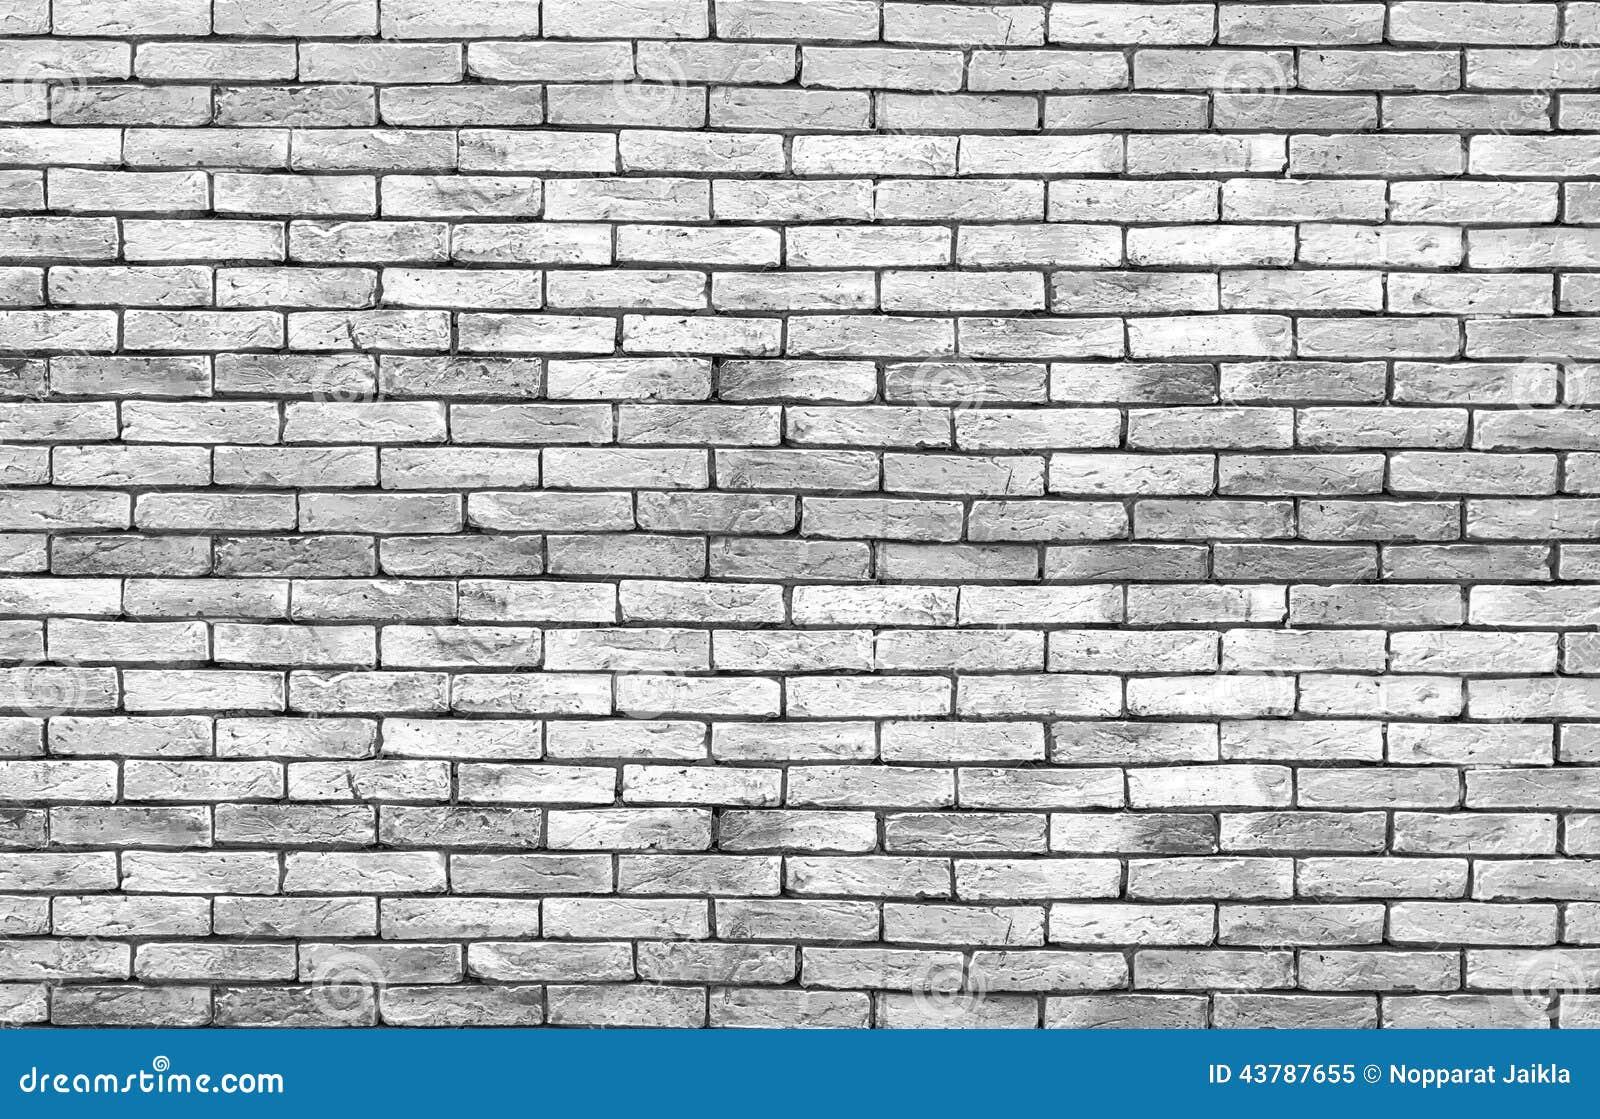 High Resolution Low Key Grunge Brick Wall Background Stock ... Кирпич Белый Фон